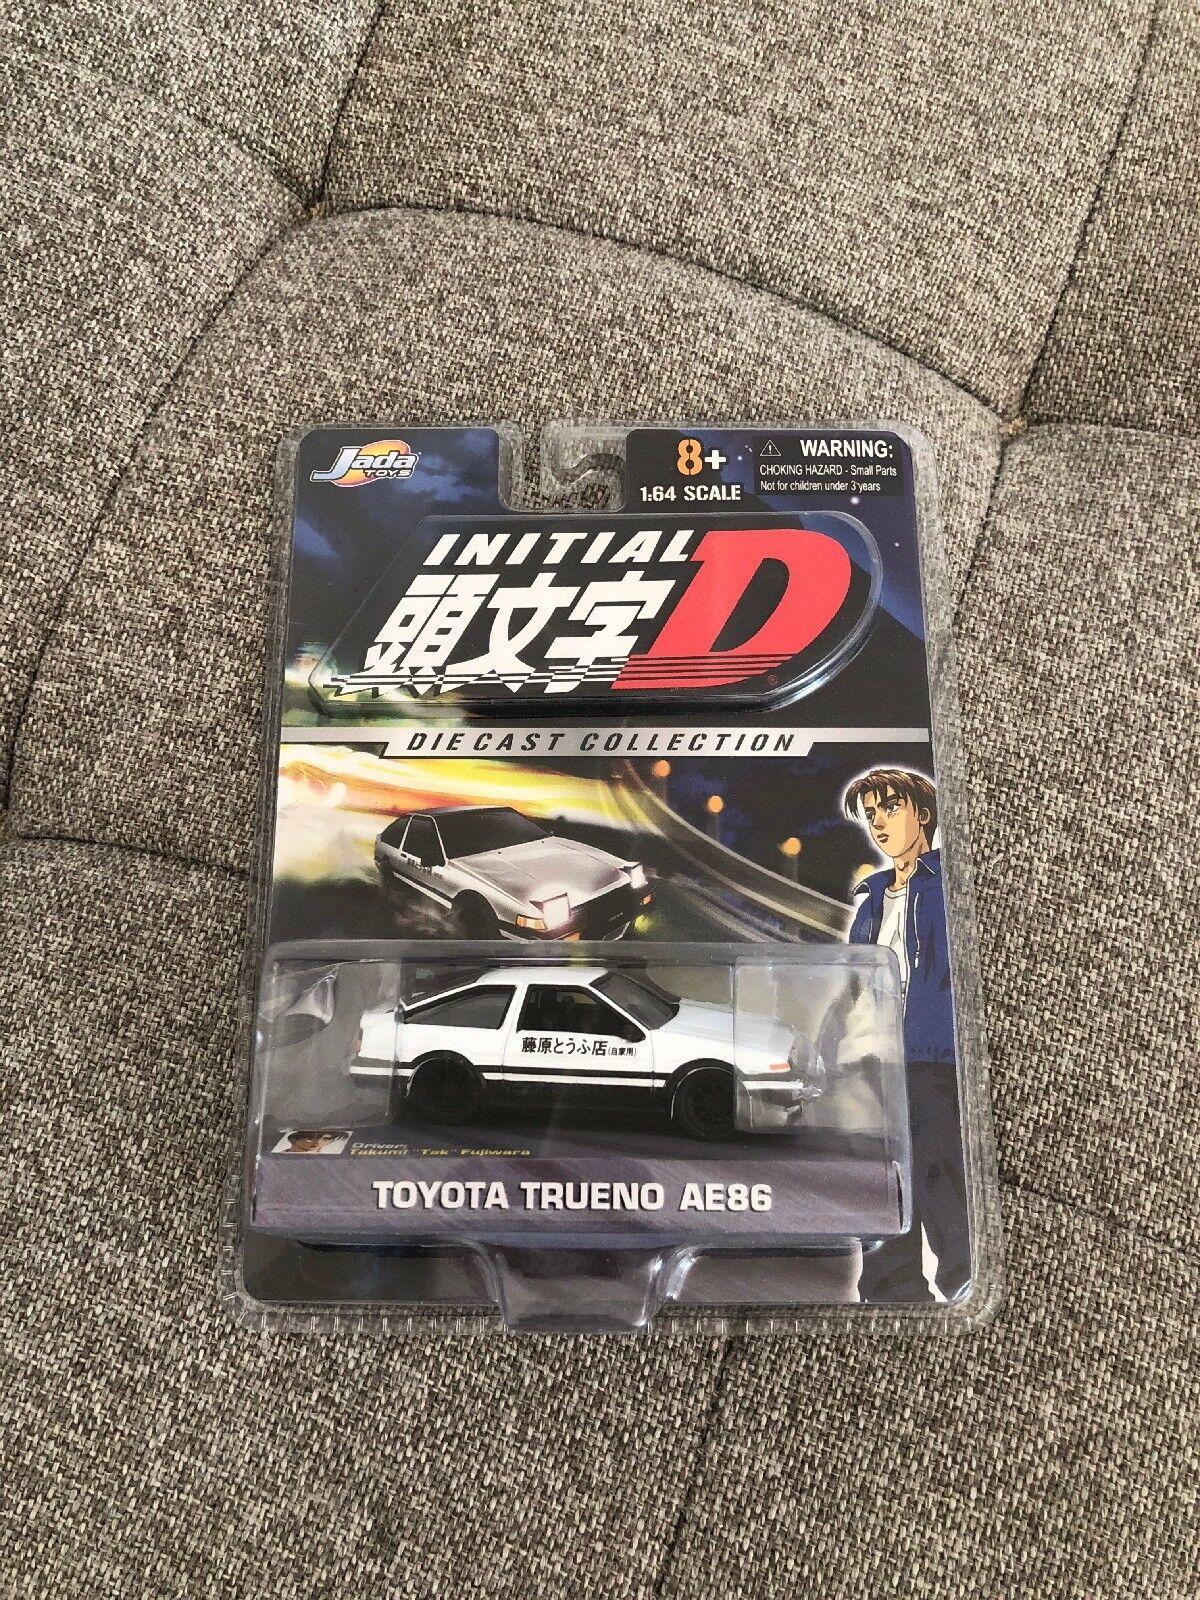 Nouveau initial D Toyota Toyota AE86 1 64 Scale Diecast Takumi Fujiwara Jada Toys